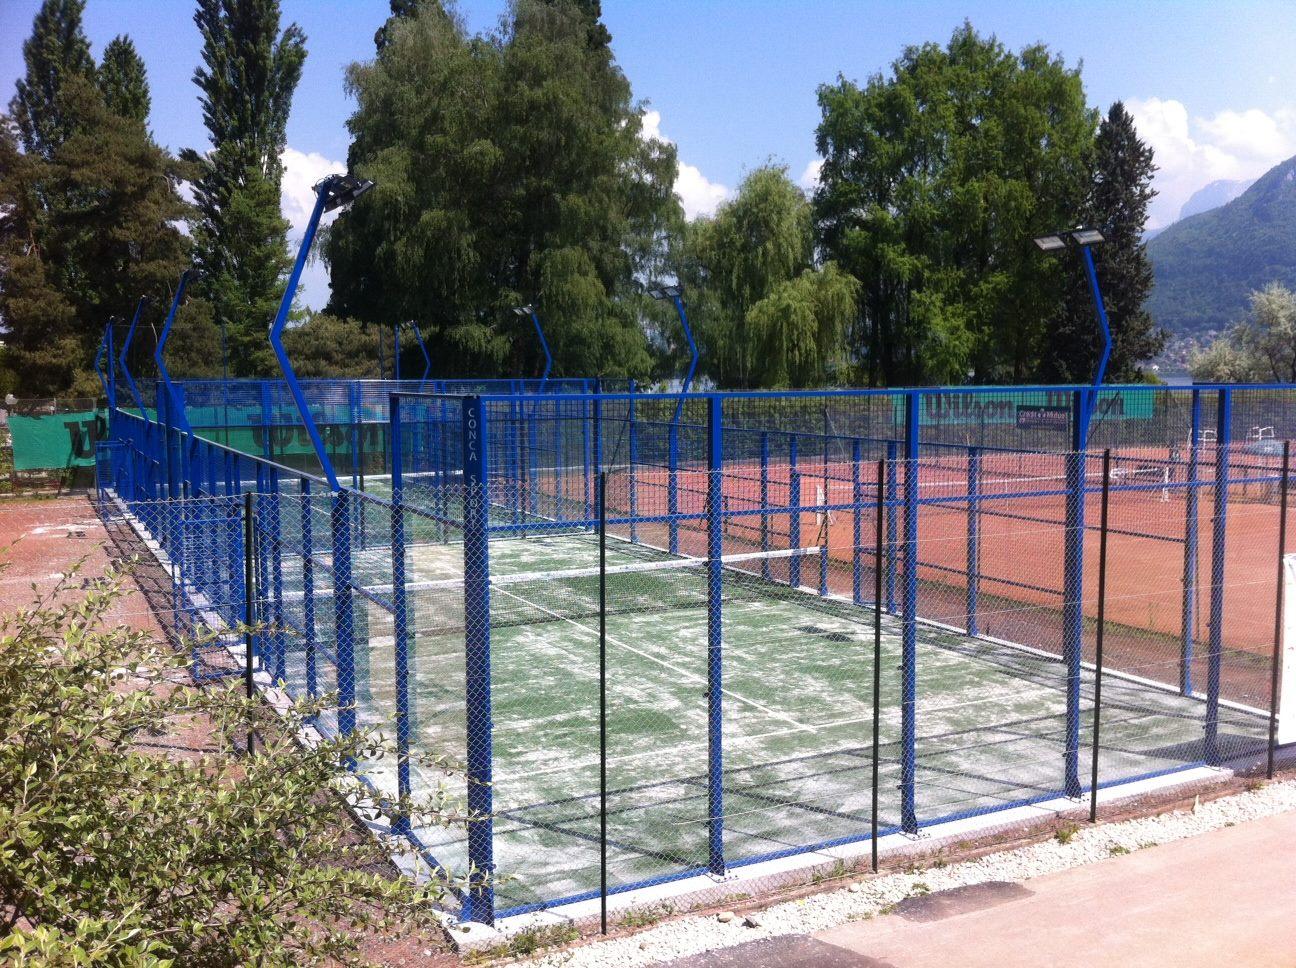 Tennis Padel Annecy avec 2 terrains